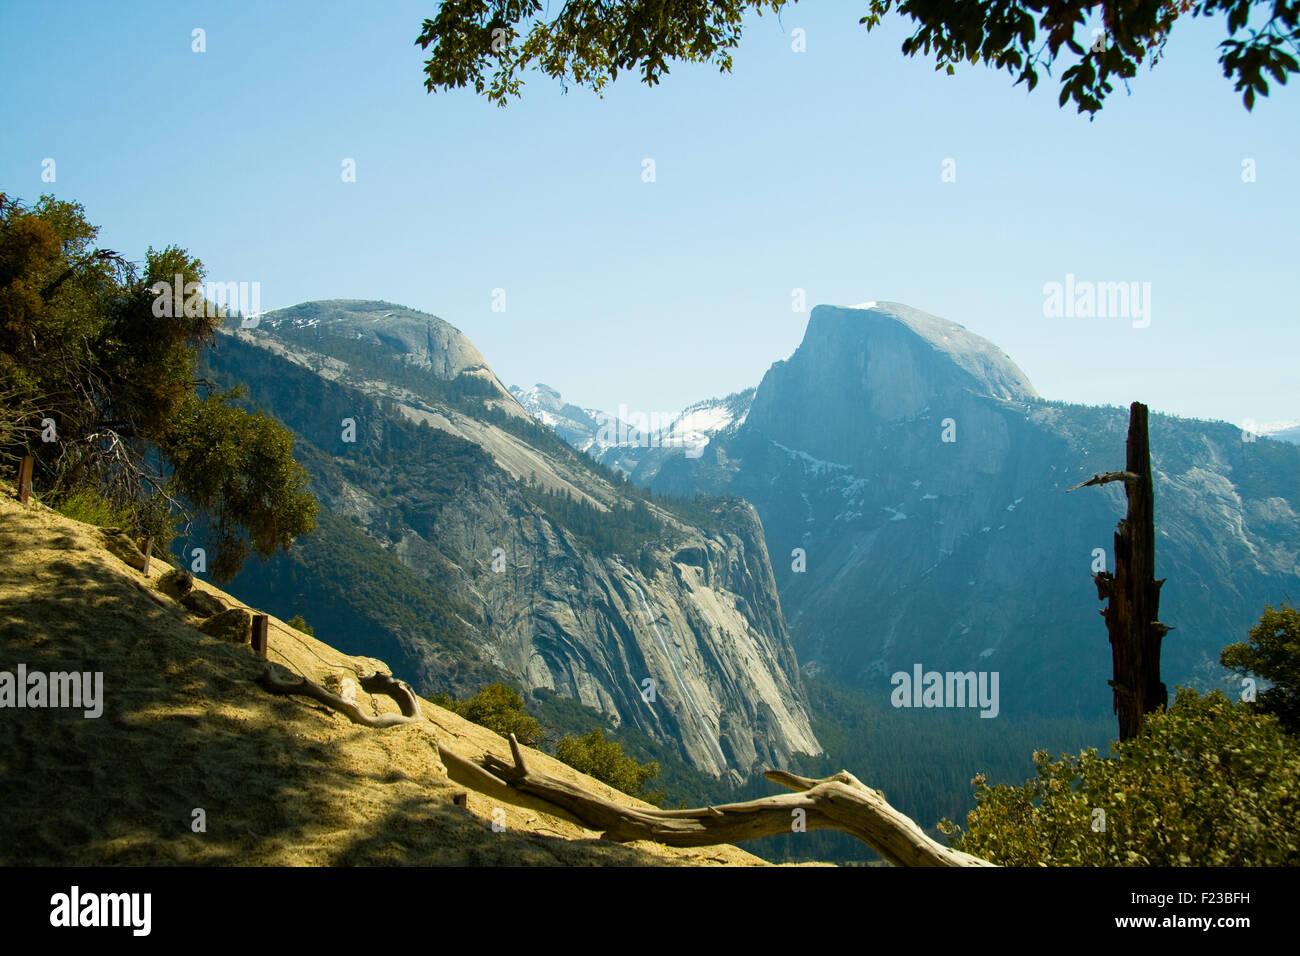 Granite dome, Half Dome, Yosemite Valley, Yosemite National Park, California, USA Stock Photo